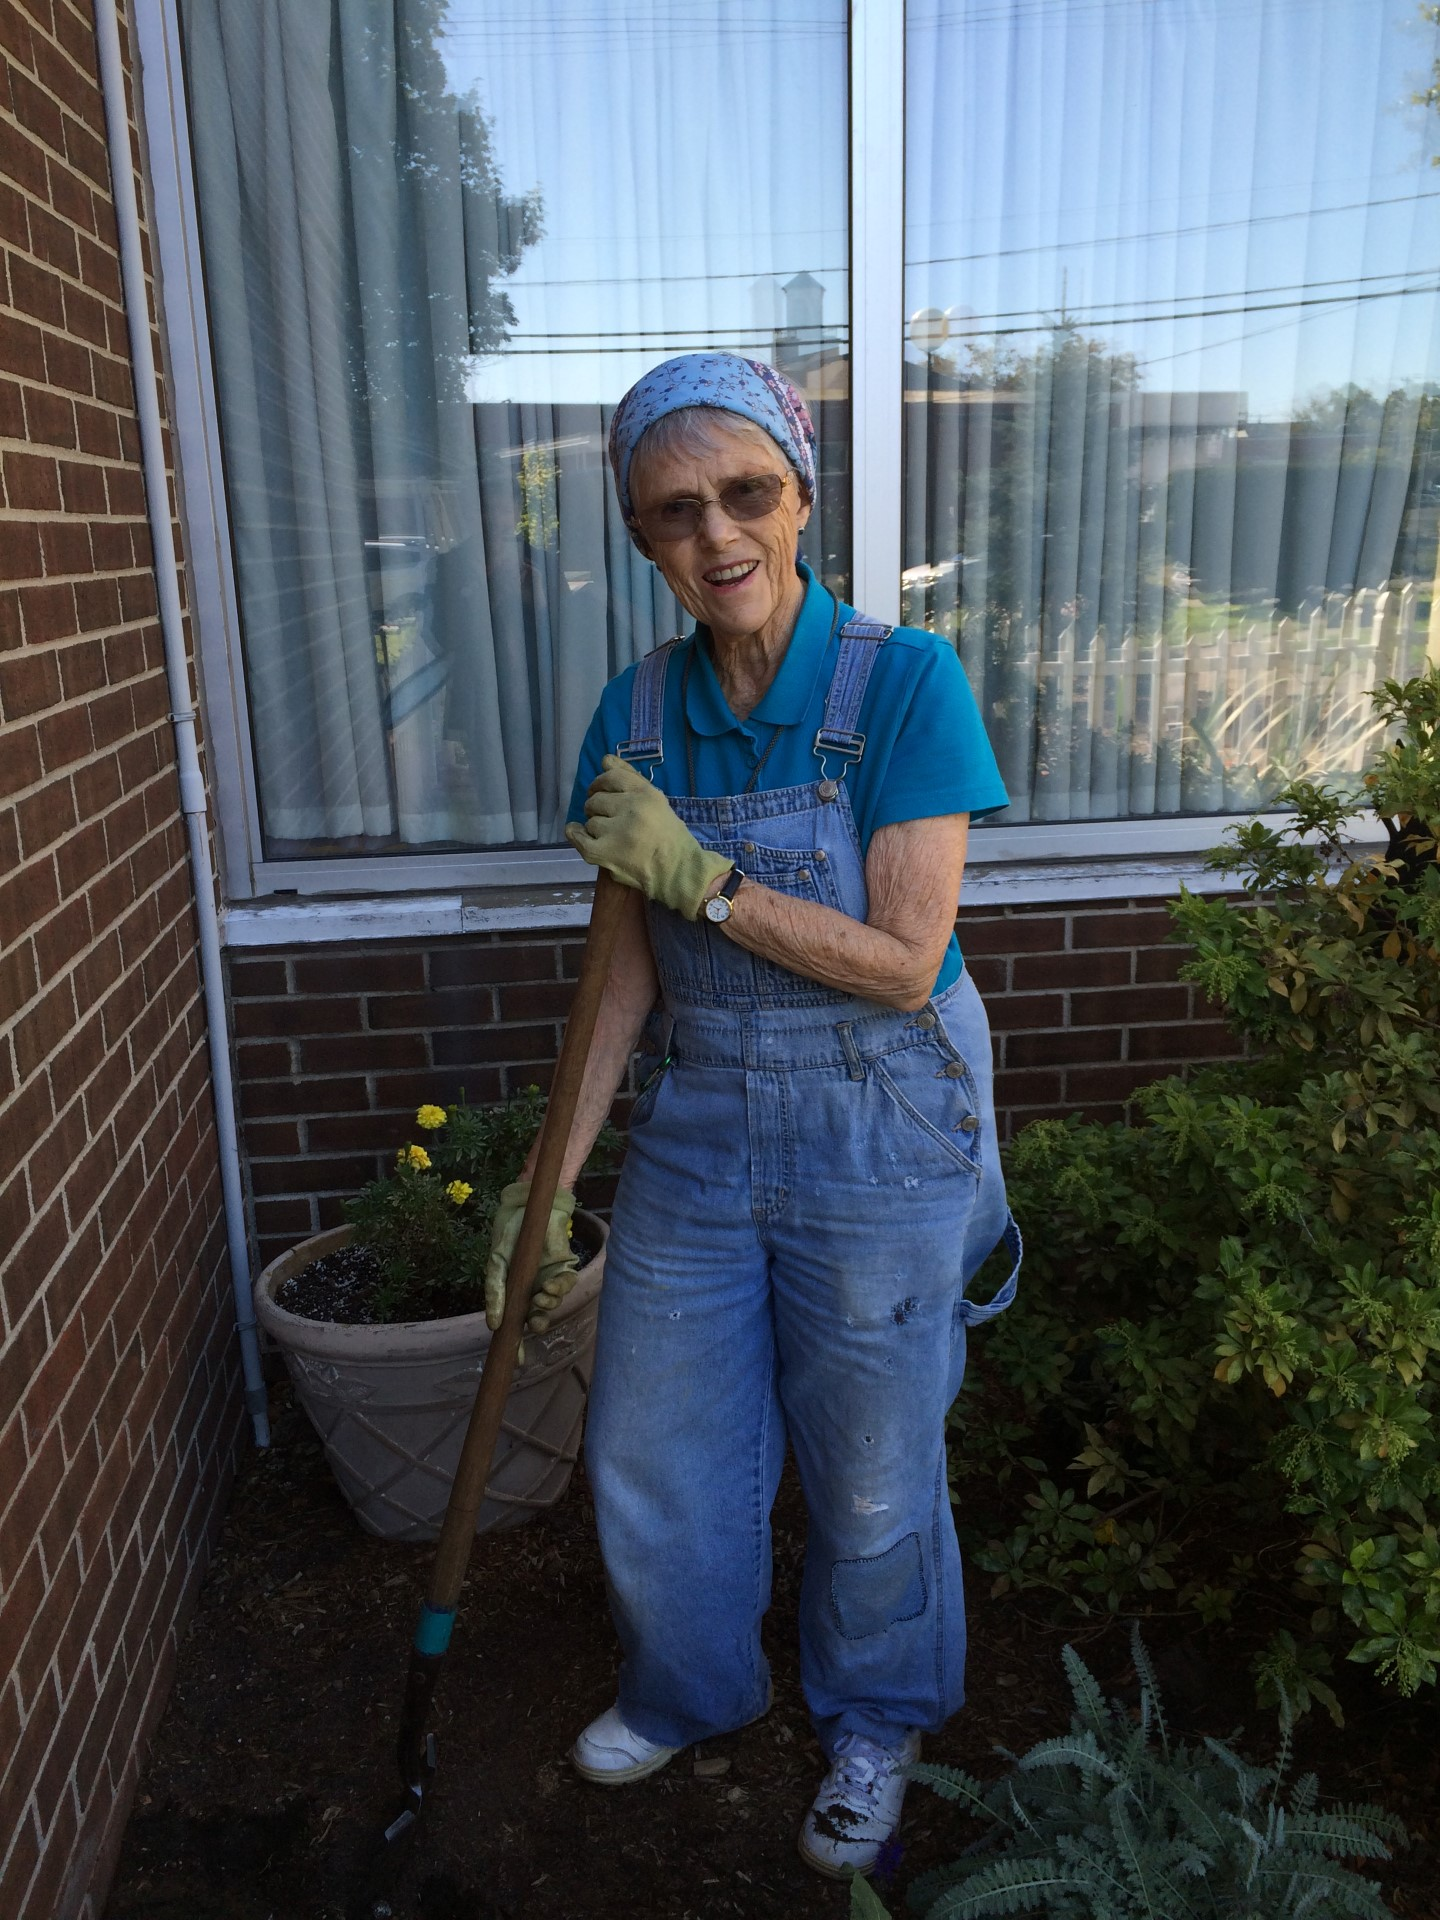 Joan raking in the Spring